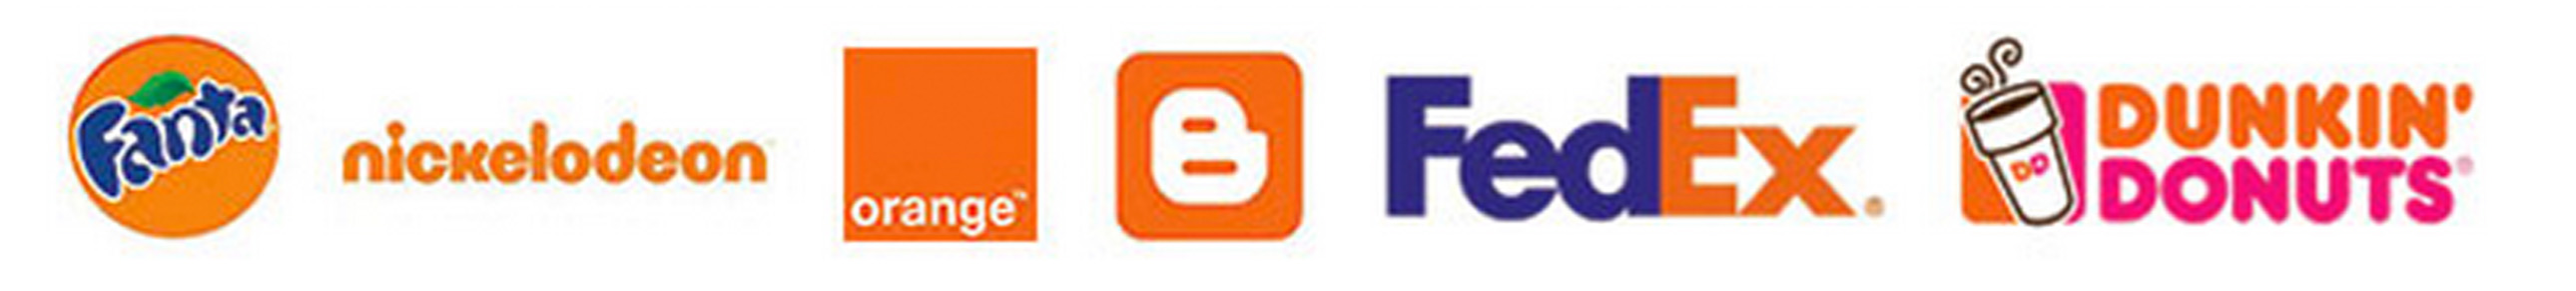 orange-color-brand